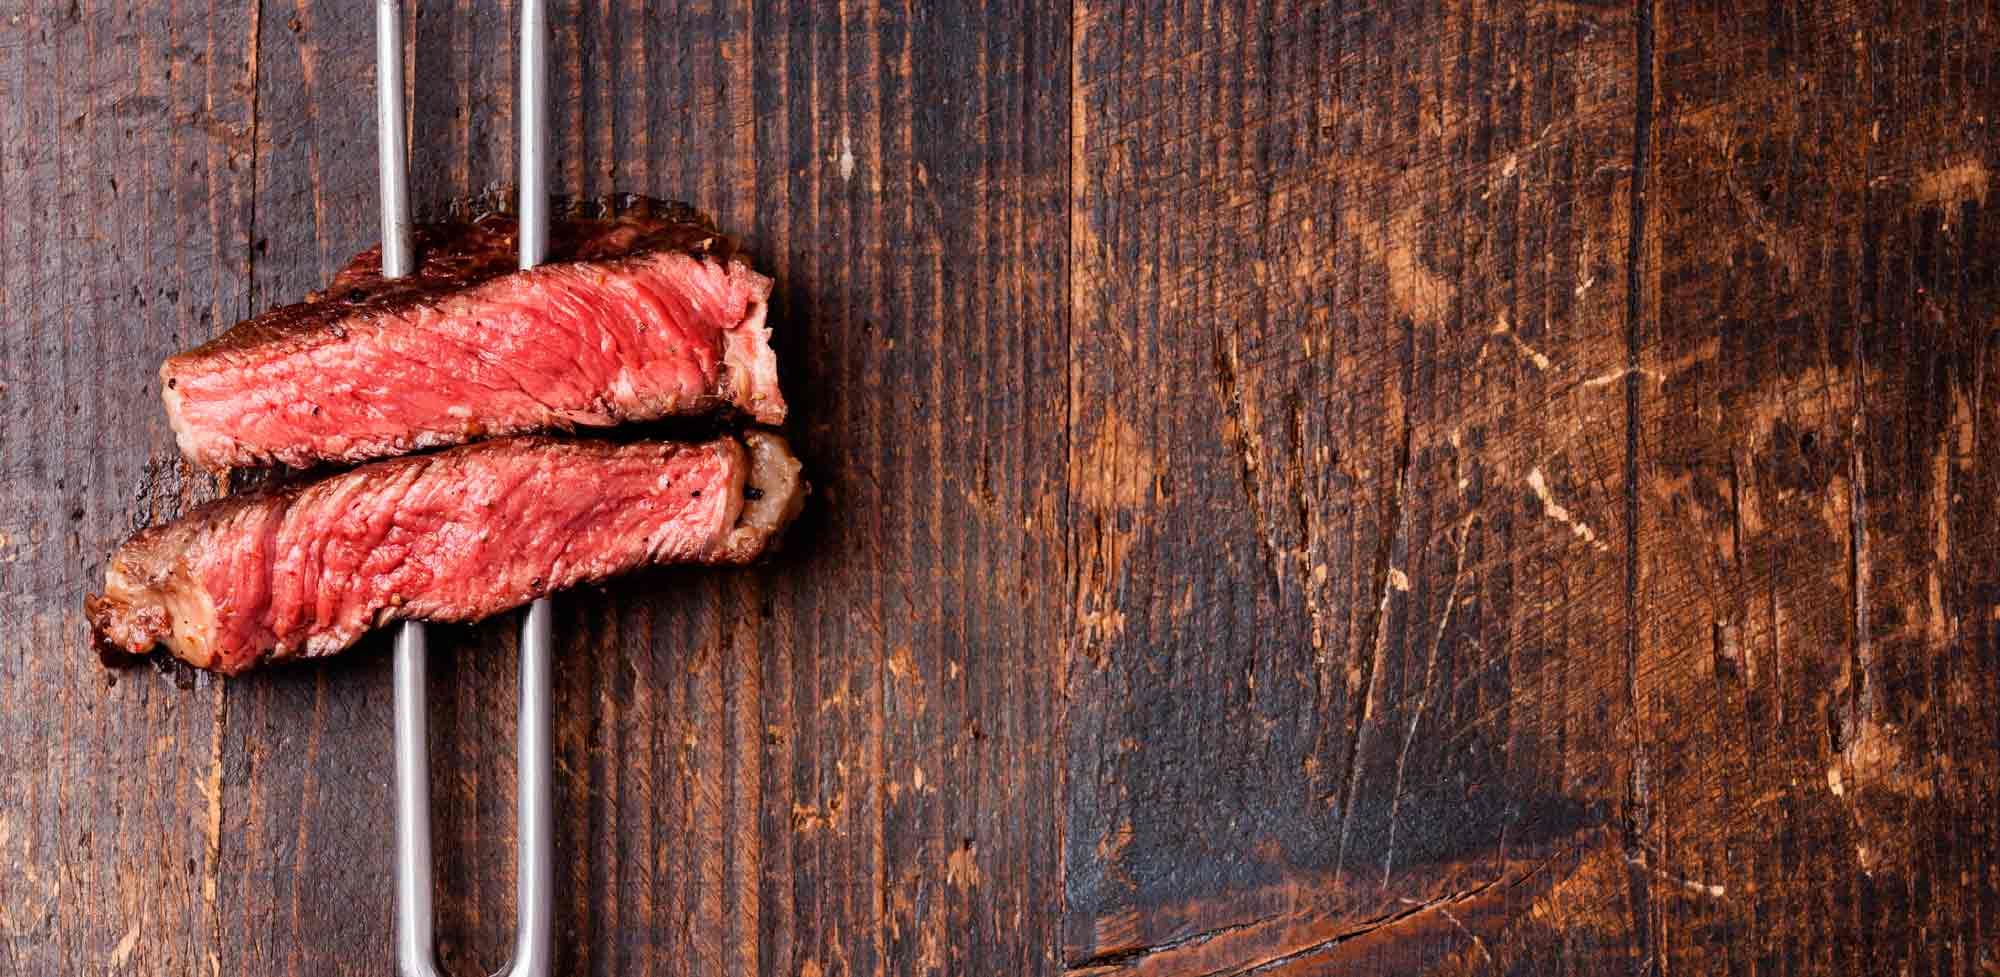 meat-background.jpg